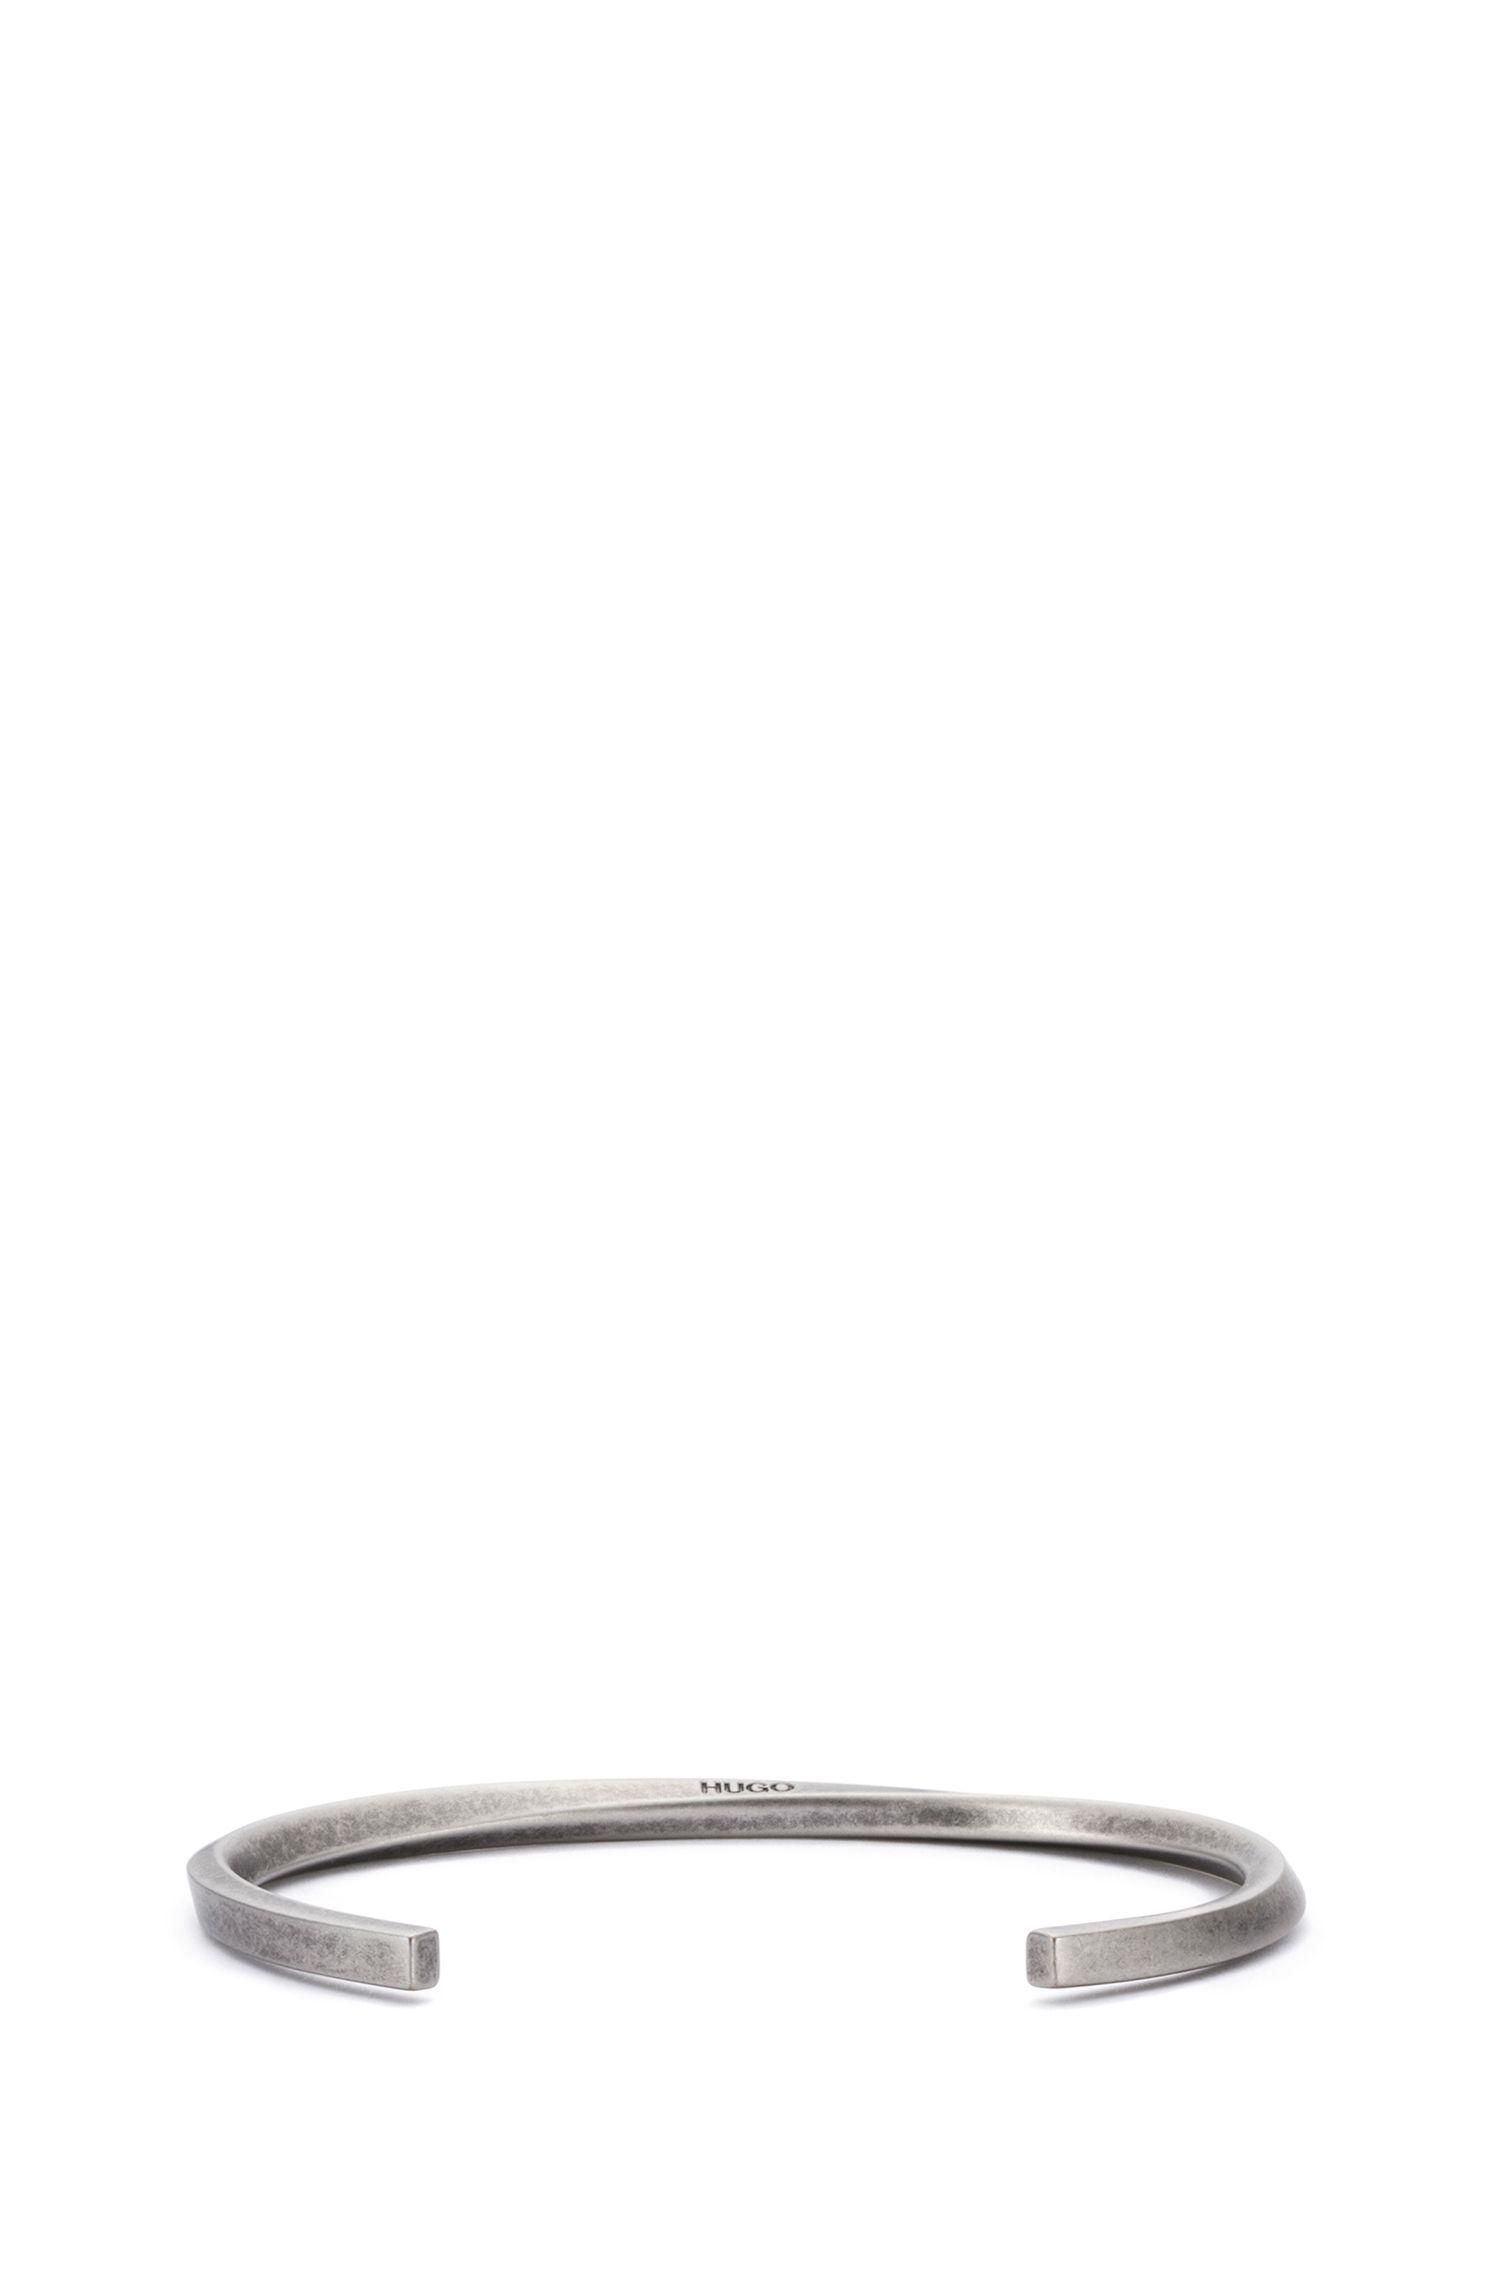 Brushed Brass Bangle | E-Squared Bangle, Silver